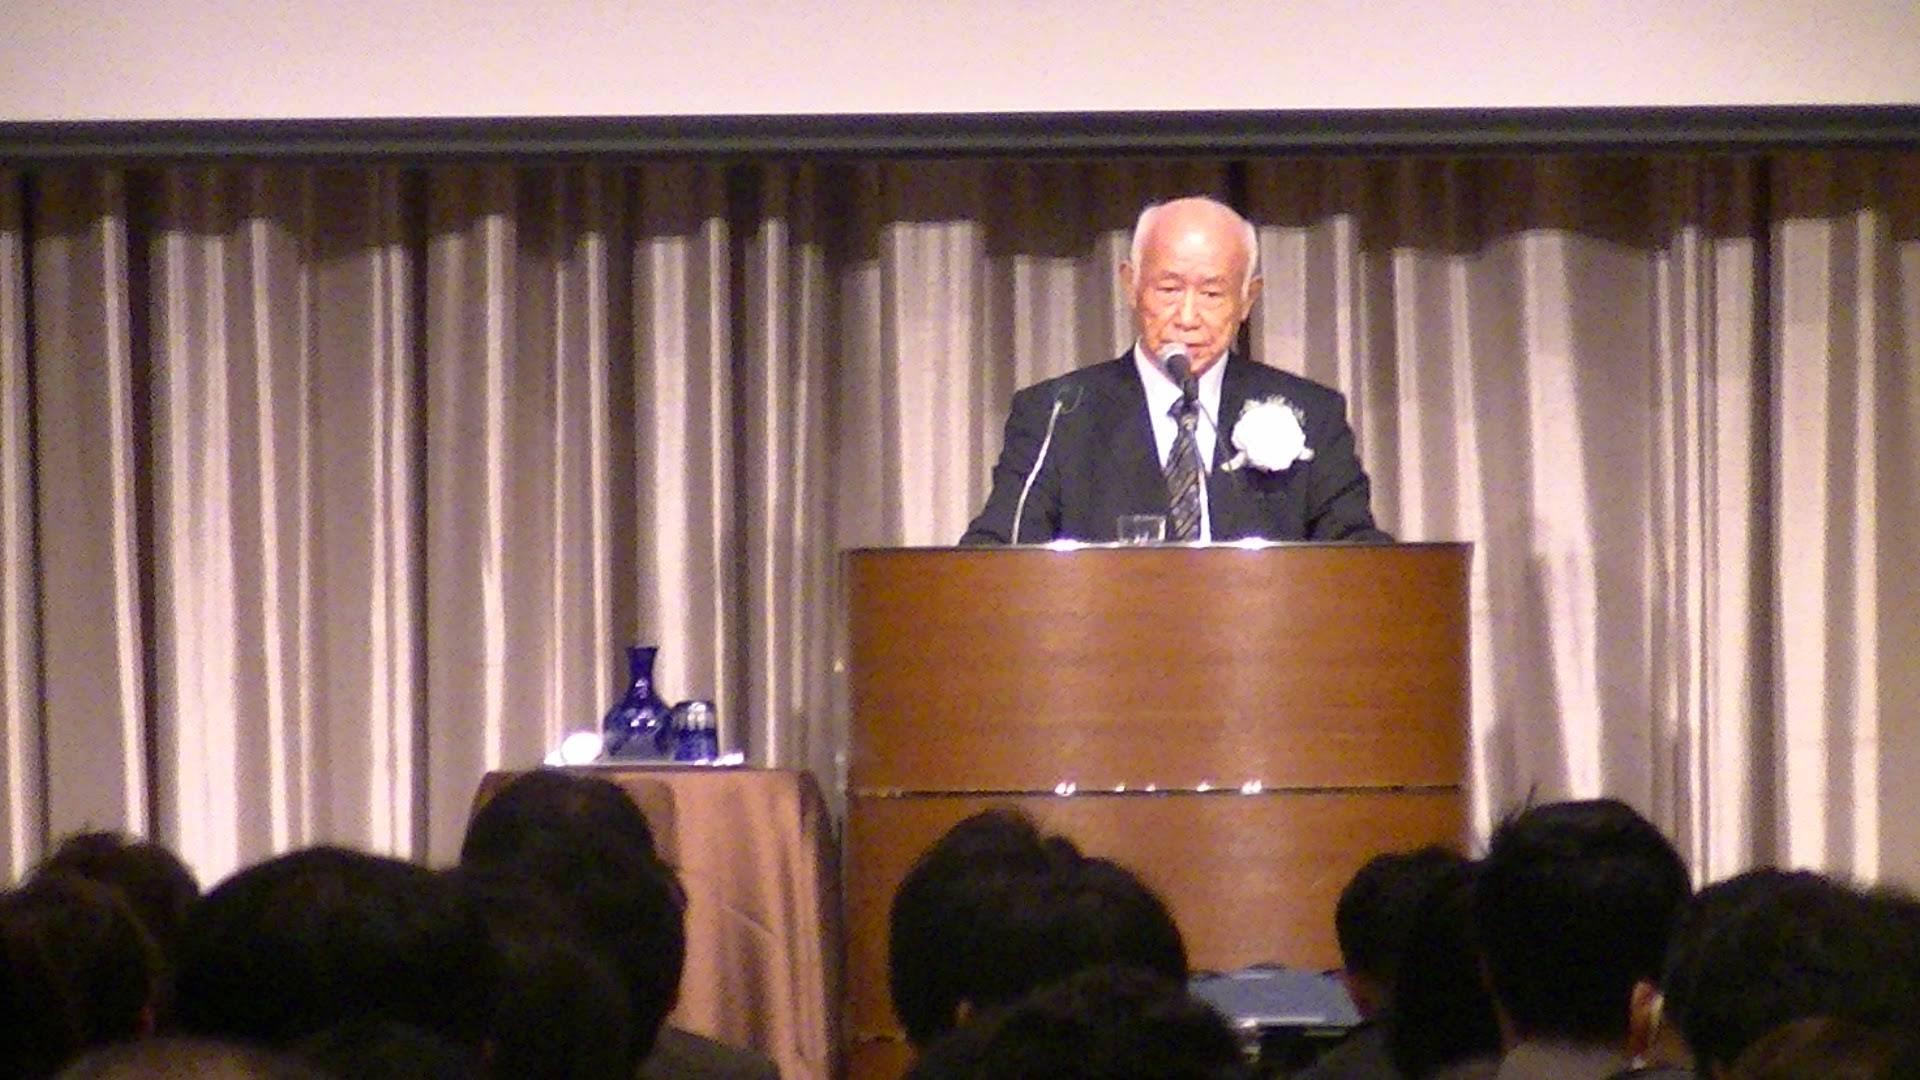 PIC 1672 1 - 思風会全国大会in広島